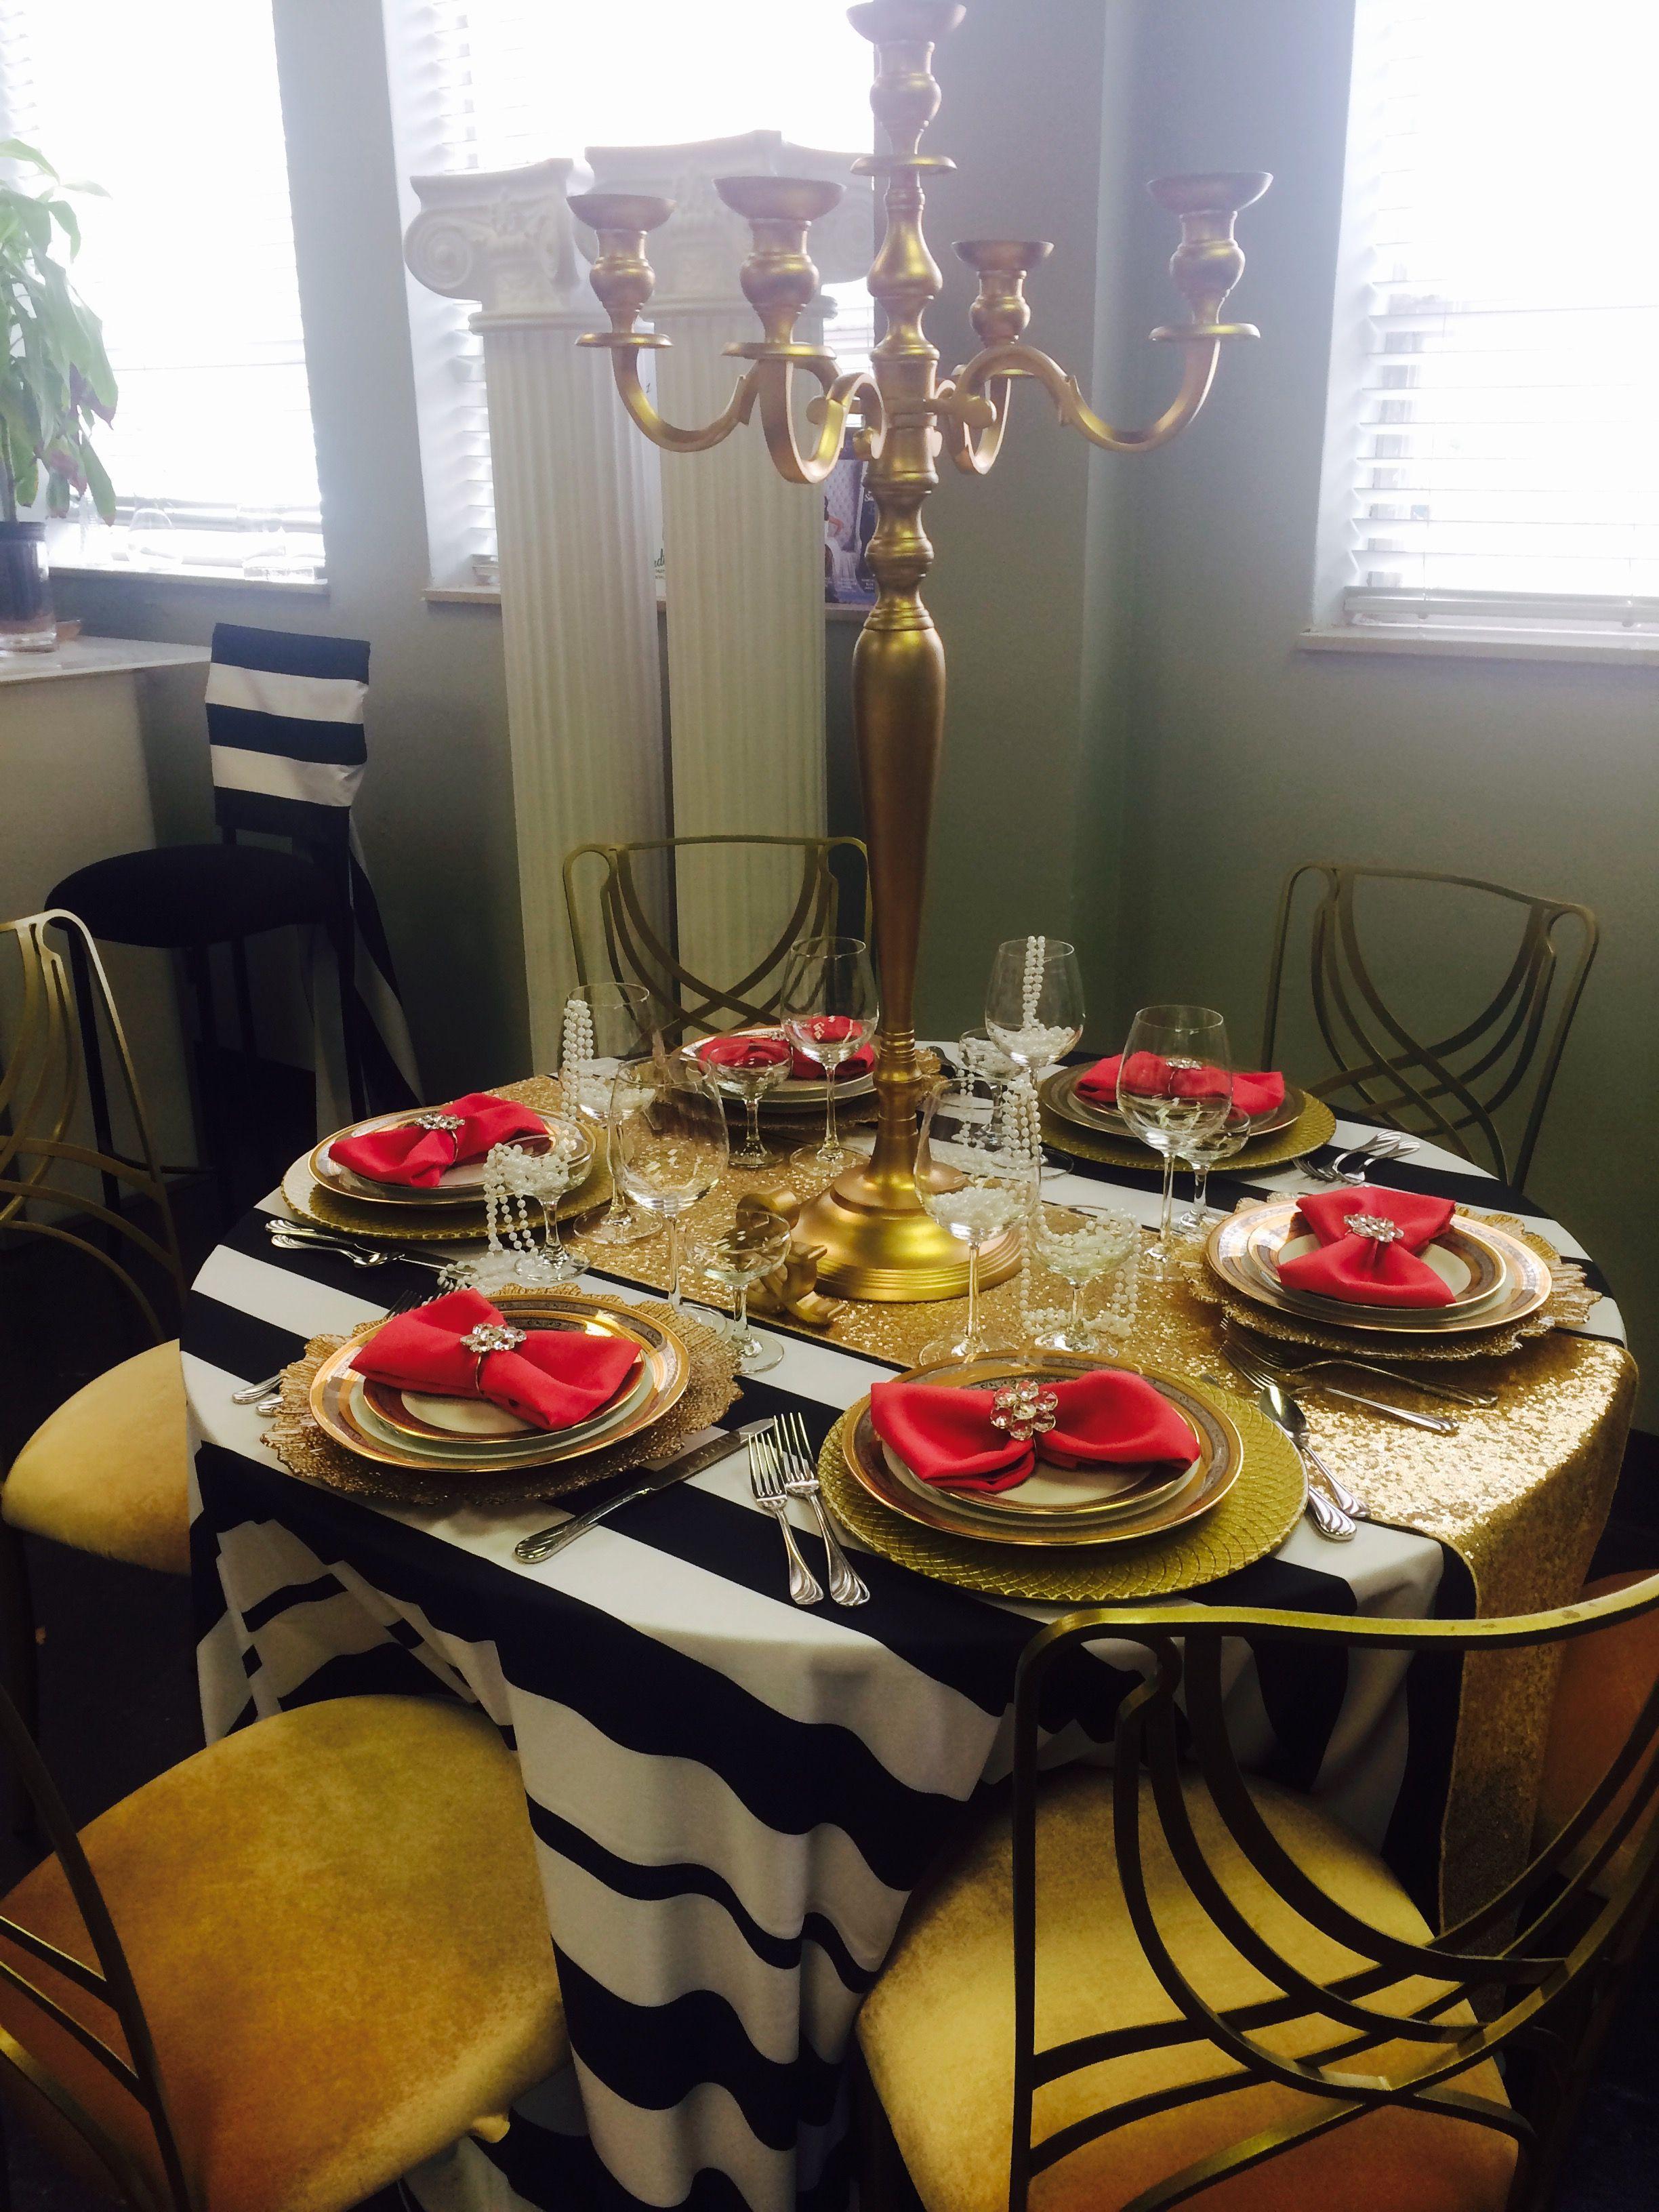 Kate Spade Table Cabana Table Linen Gold Sequin Runner Gold - Kate spade table linens